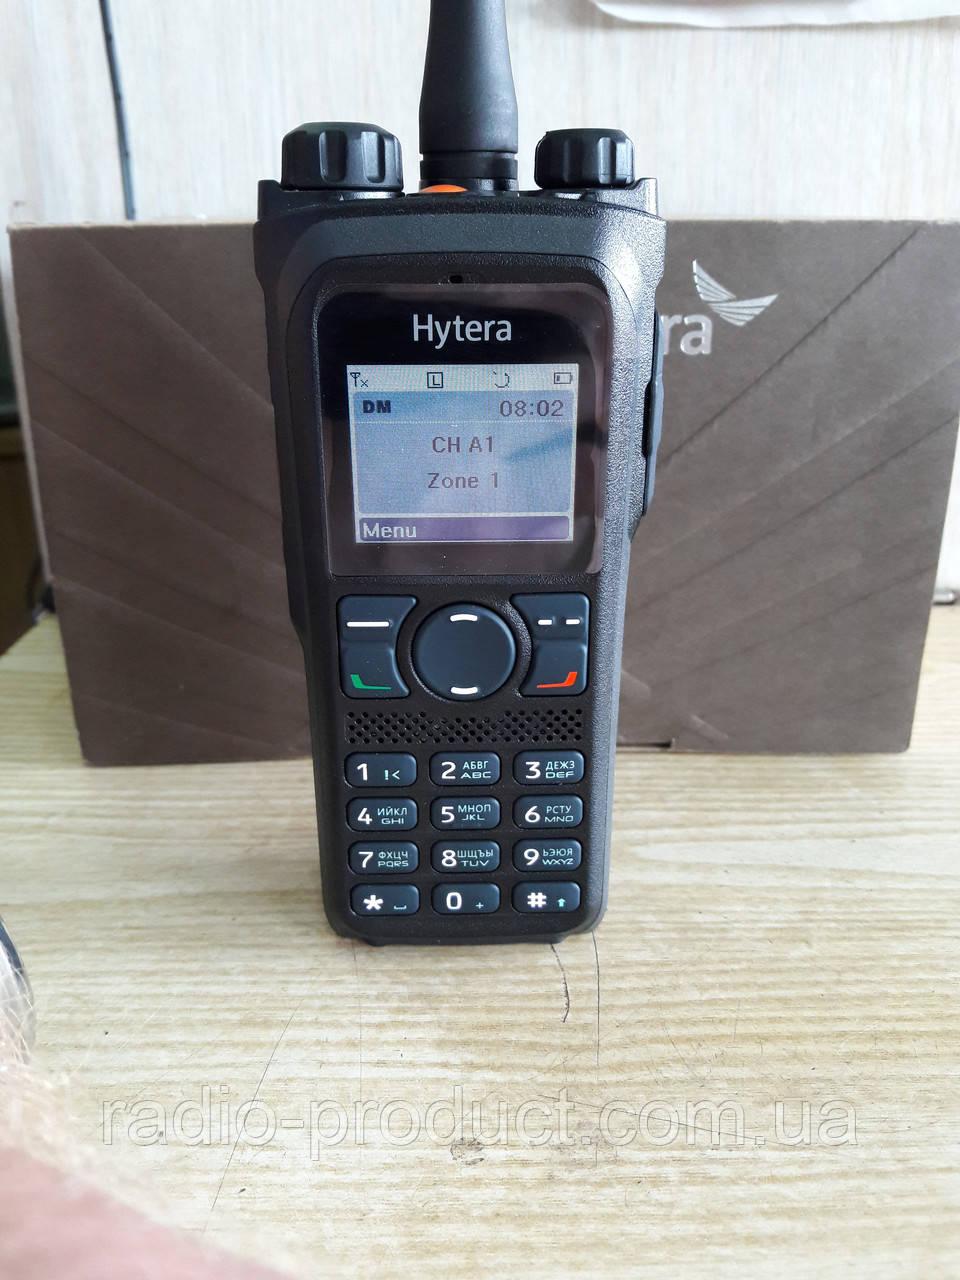 Hytera PD985, аналогово-цифровая радиостанция